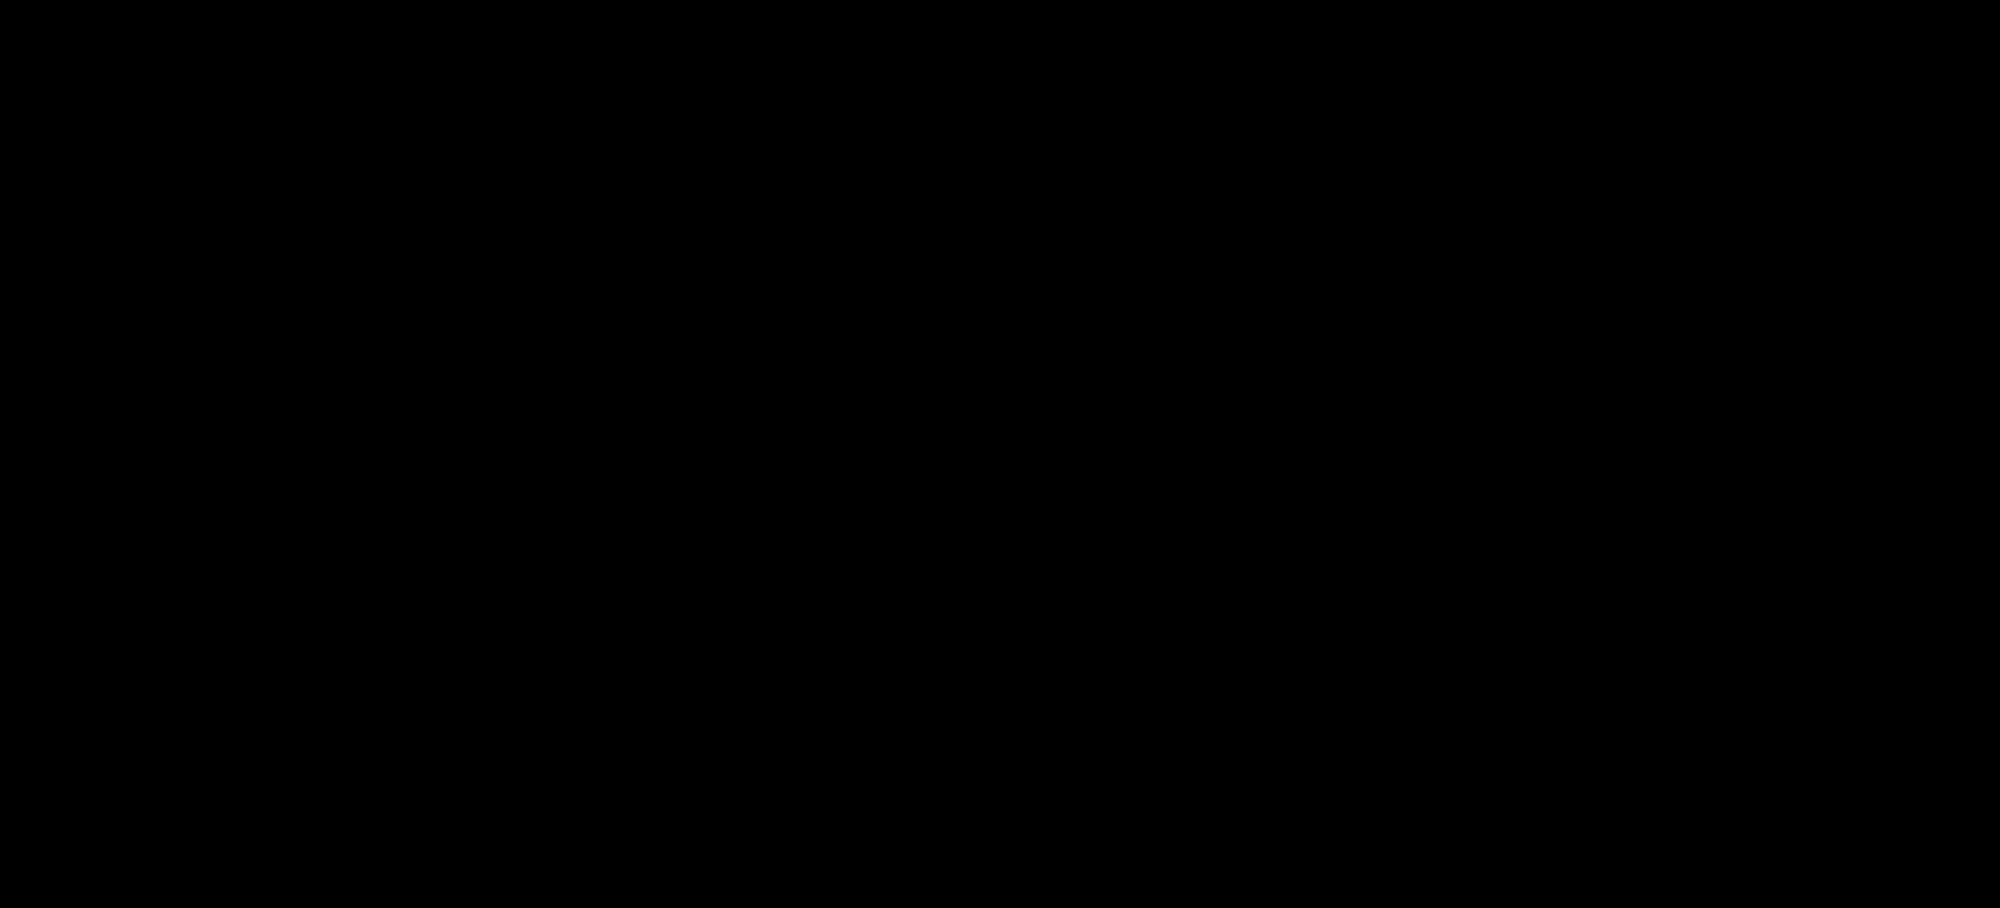 MY PRELOVED LIFE-logo.png